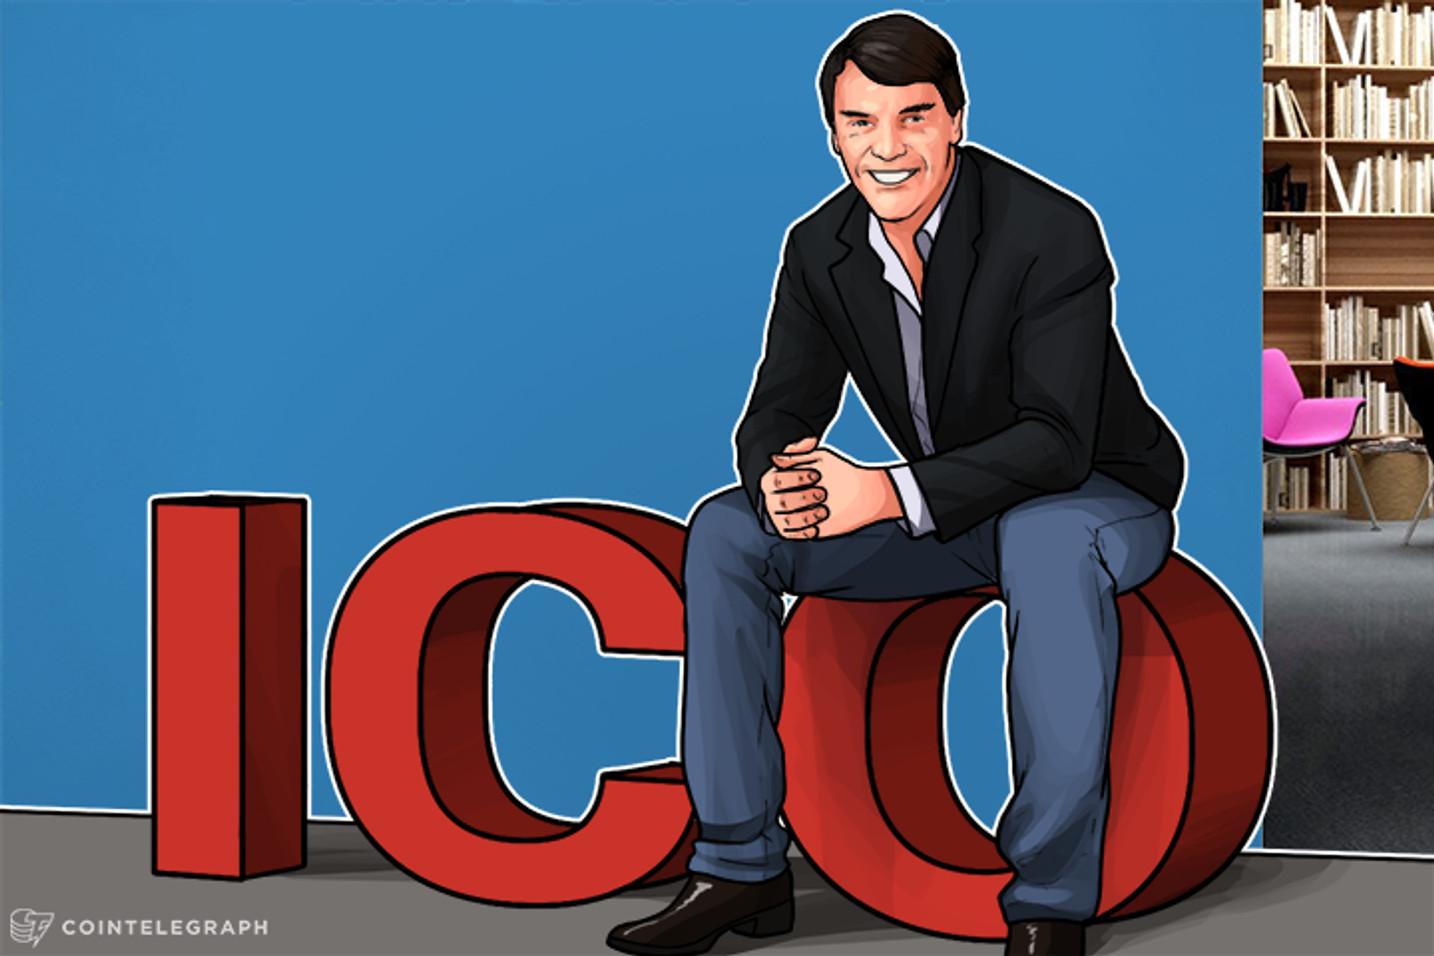 Tim Draper-Backed Blockchain Company Tezos Diverts $50 Mln into VC Fund